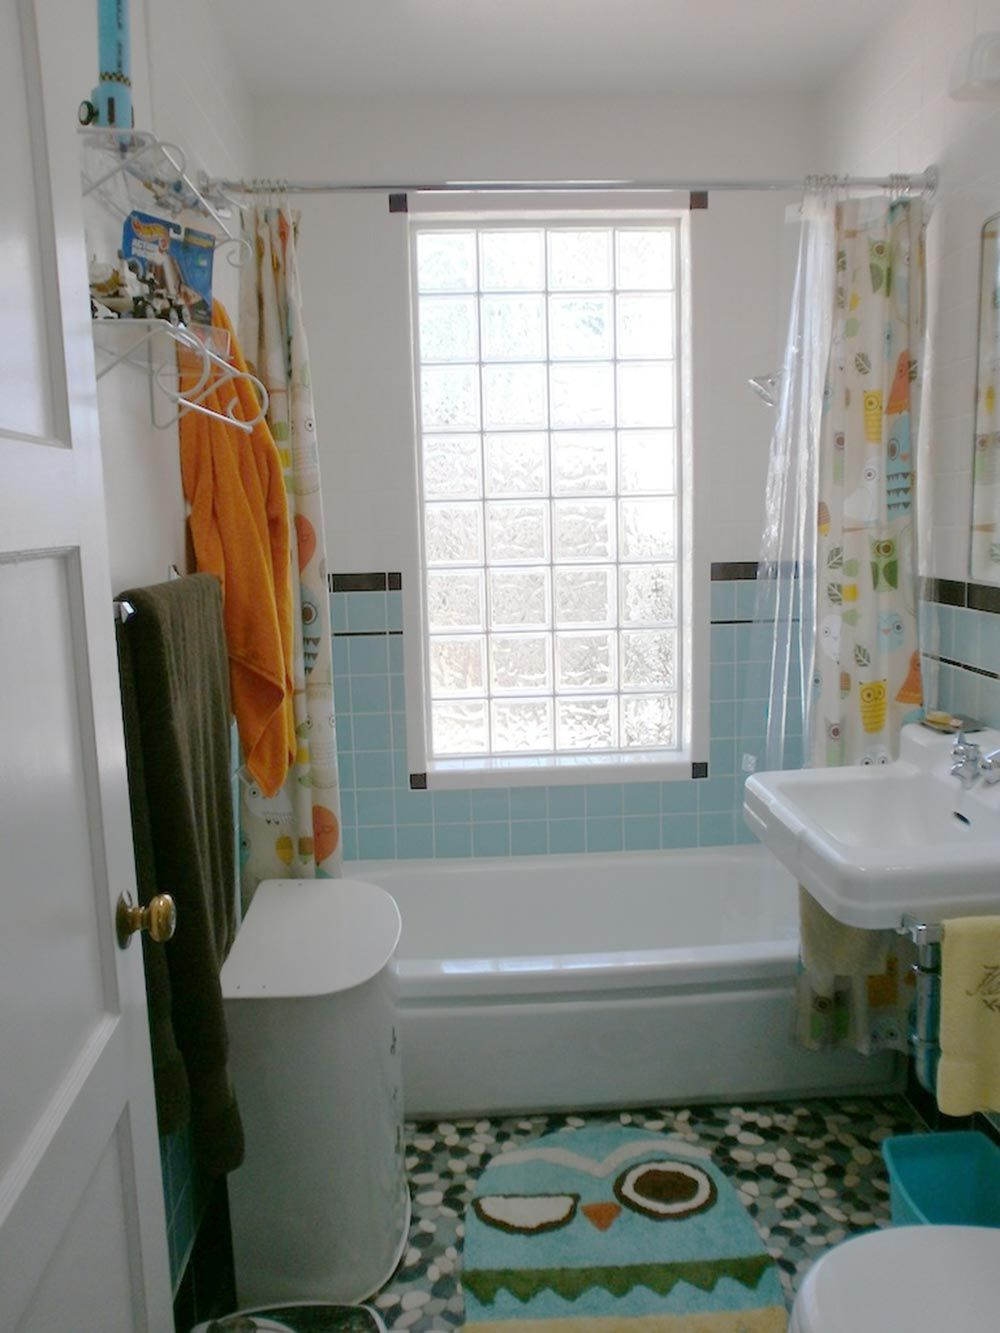 10 Retro Bathroom Ideas 2020 Revisiting The Past Trend In 2020